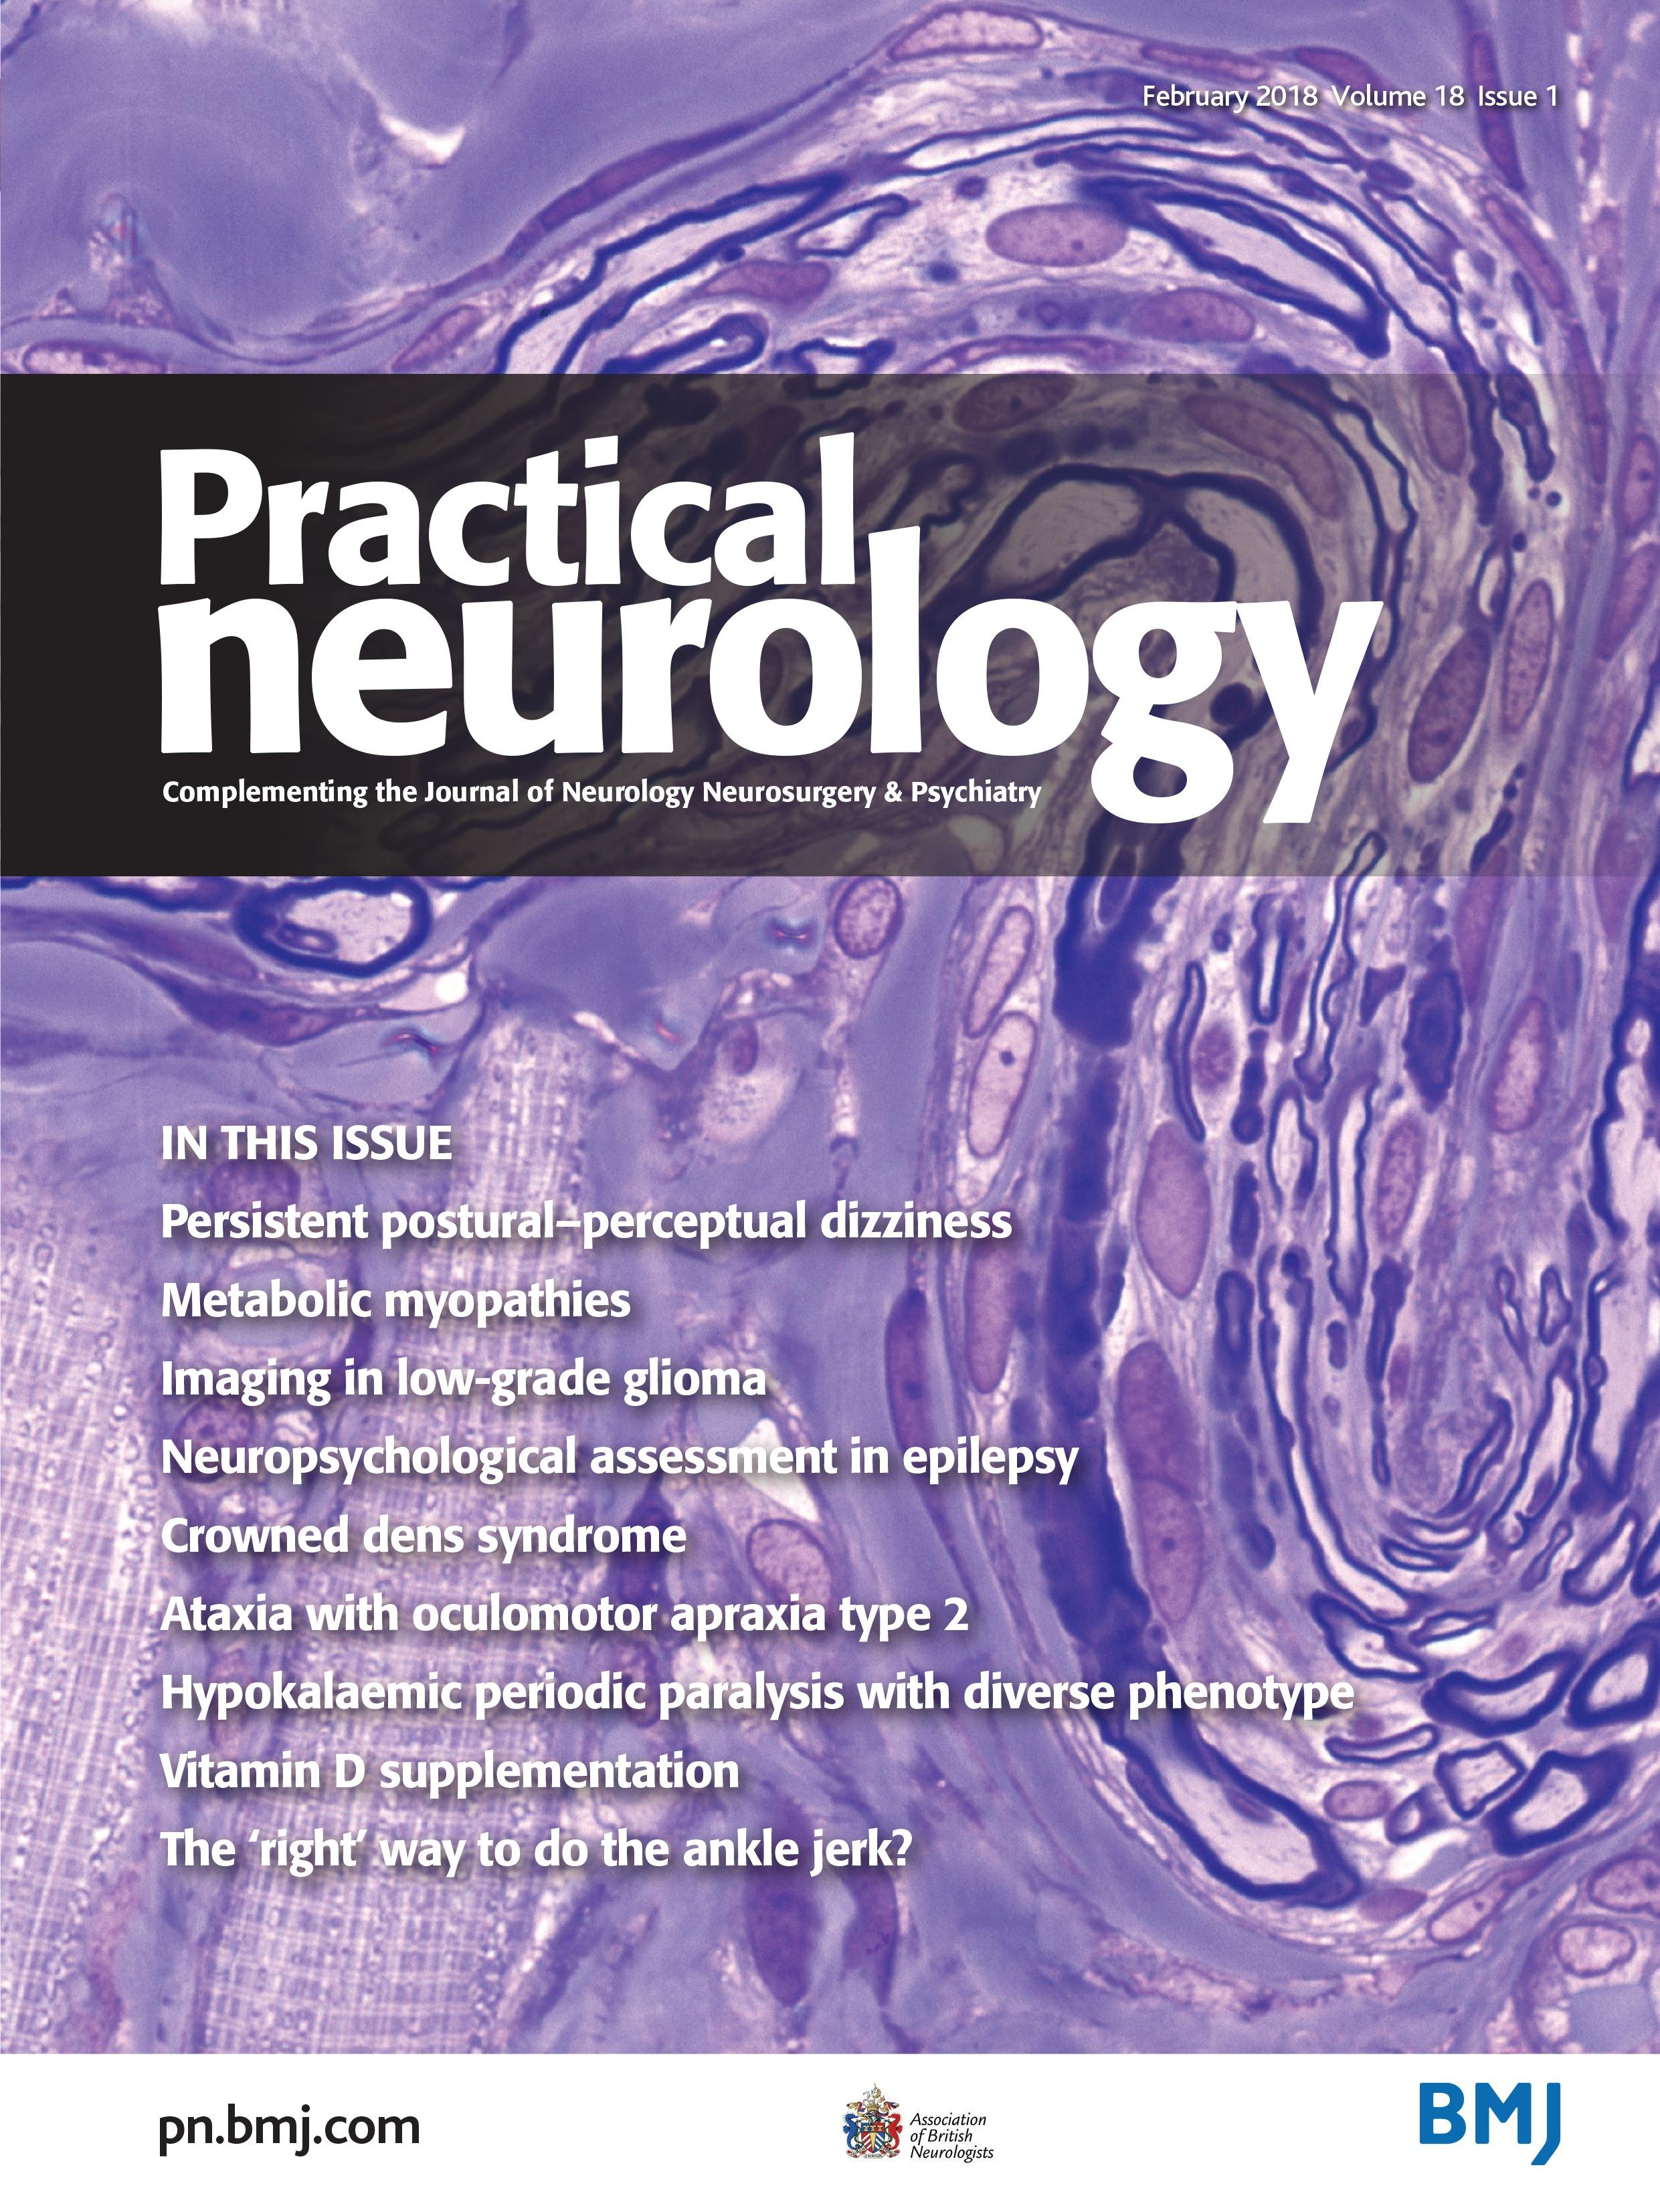 Persistent postural-perceptual dizziness (PPPD): a common